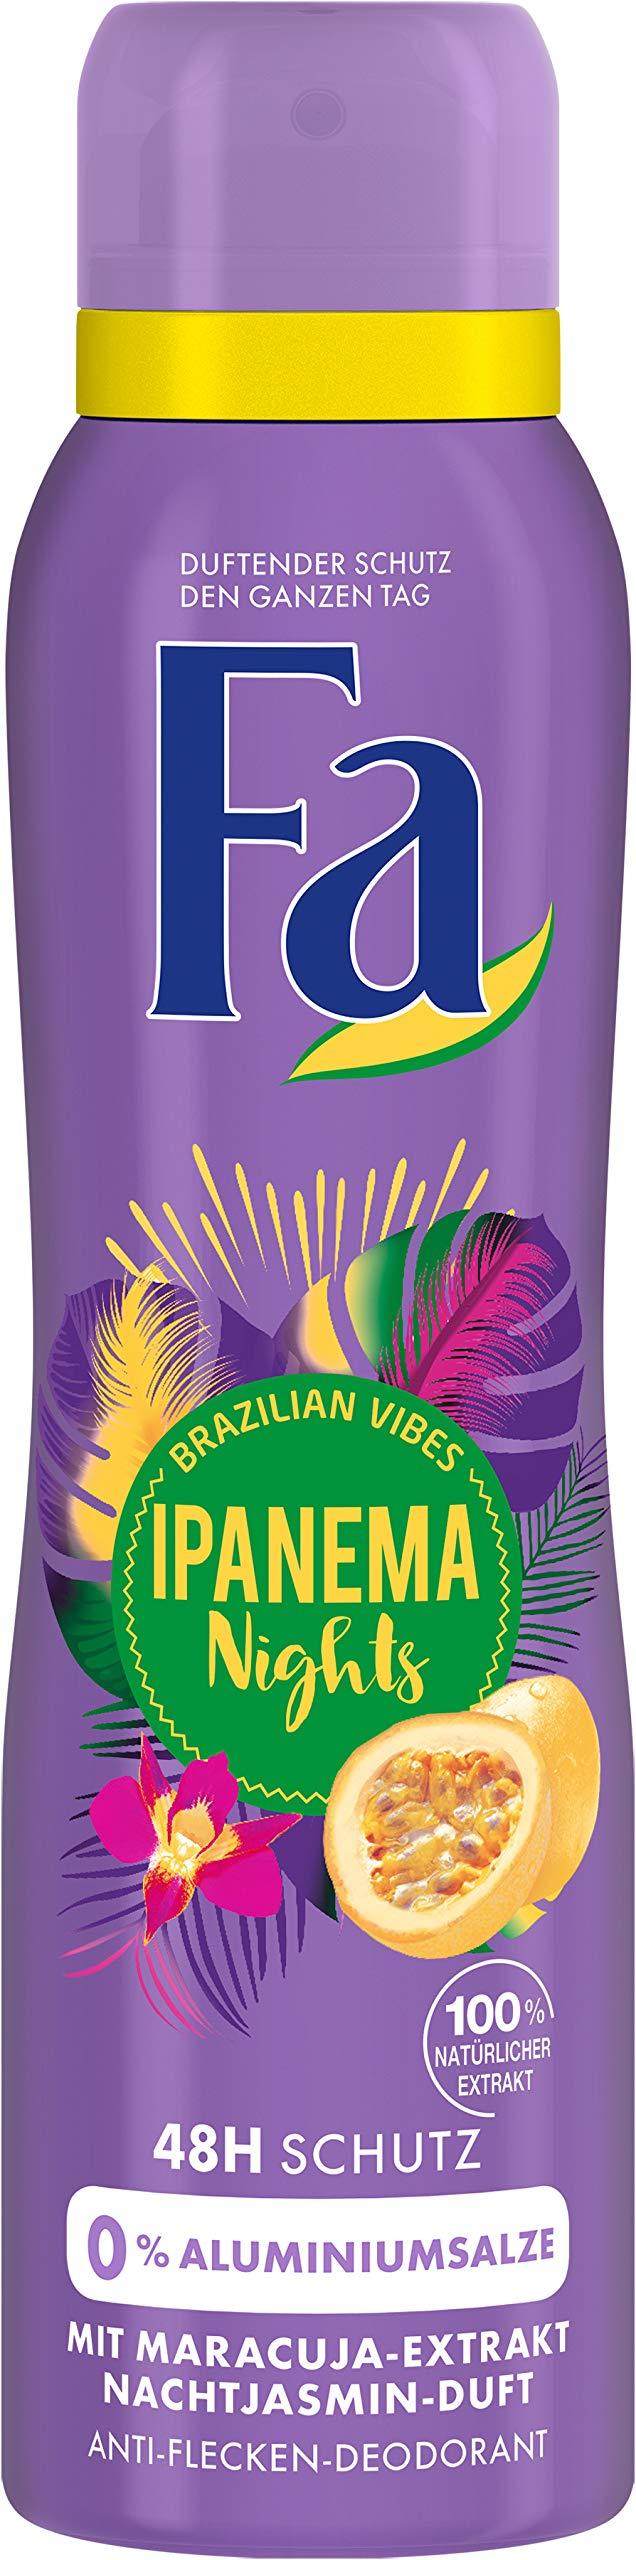 FA Deodorant Spray Brazilian Vibes Ipanema Nights Night Jasmine Fragrance 150 ml